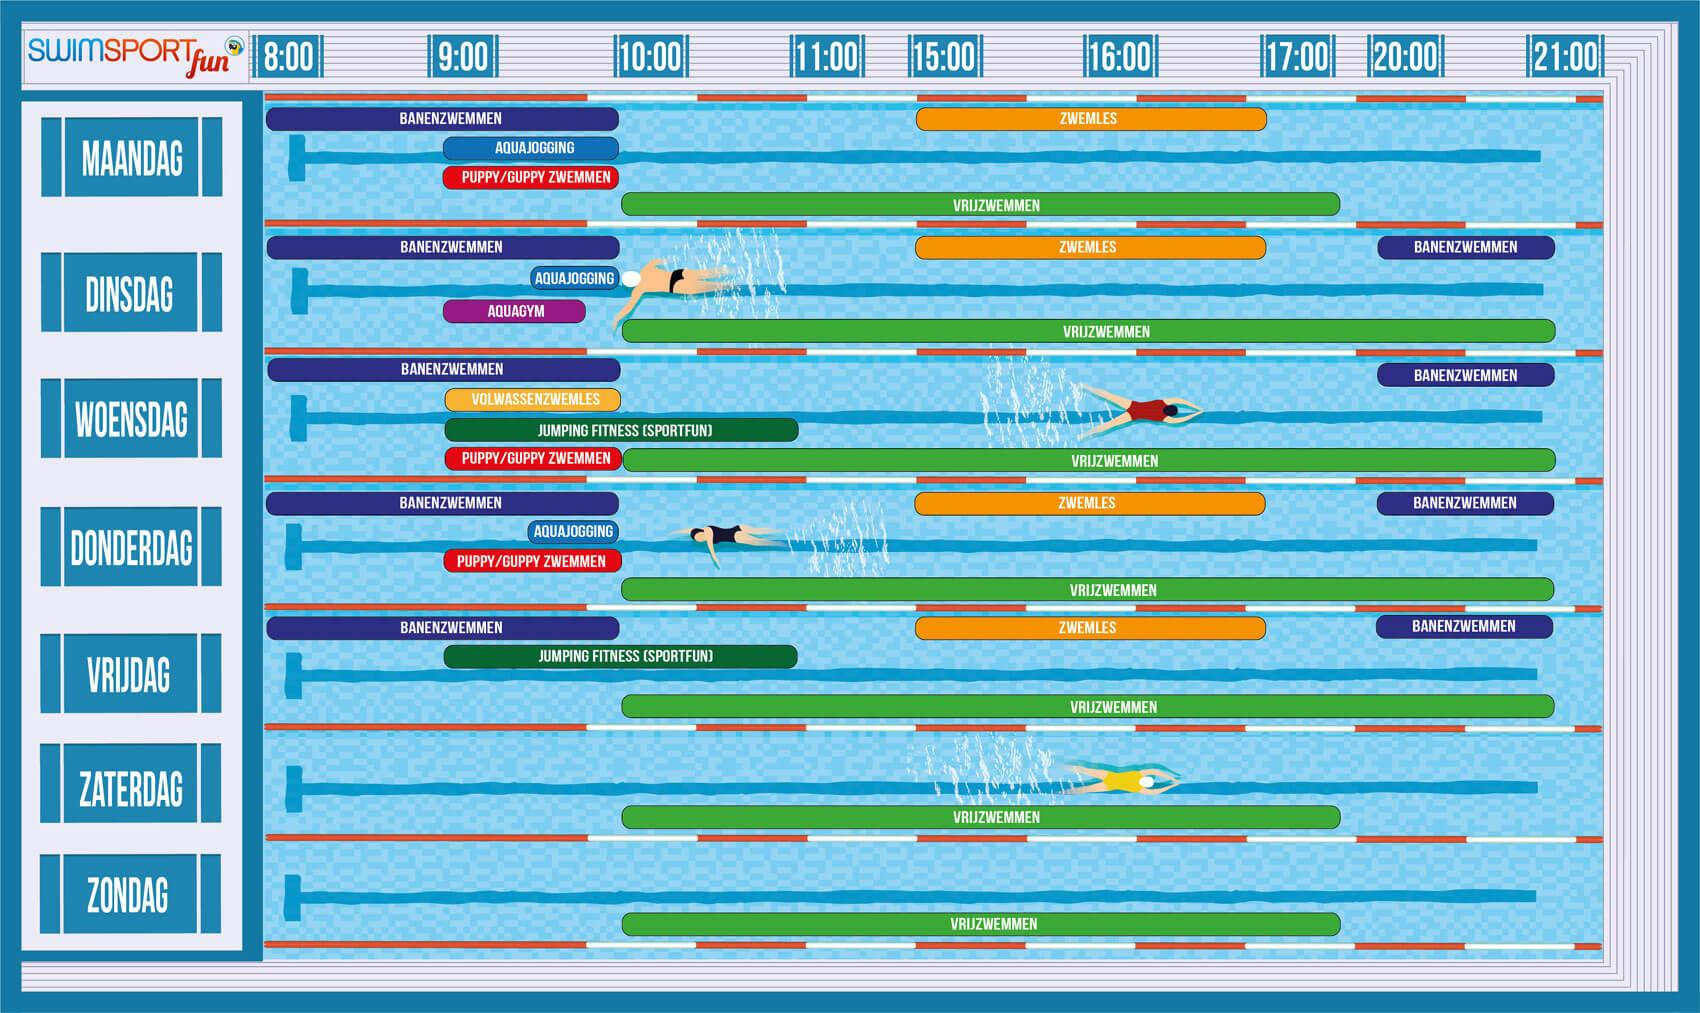 Agenda Swimfun